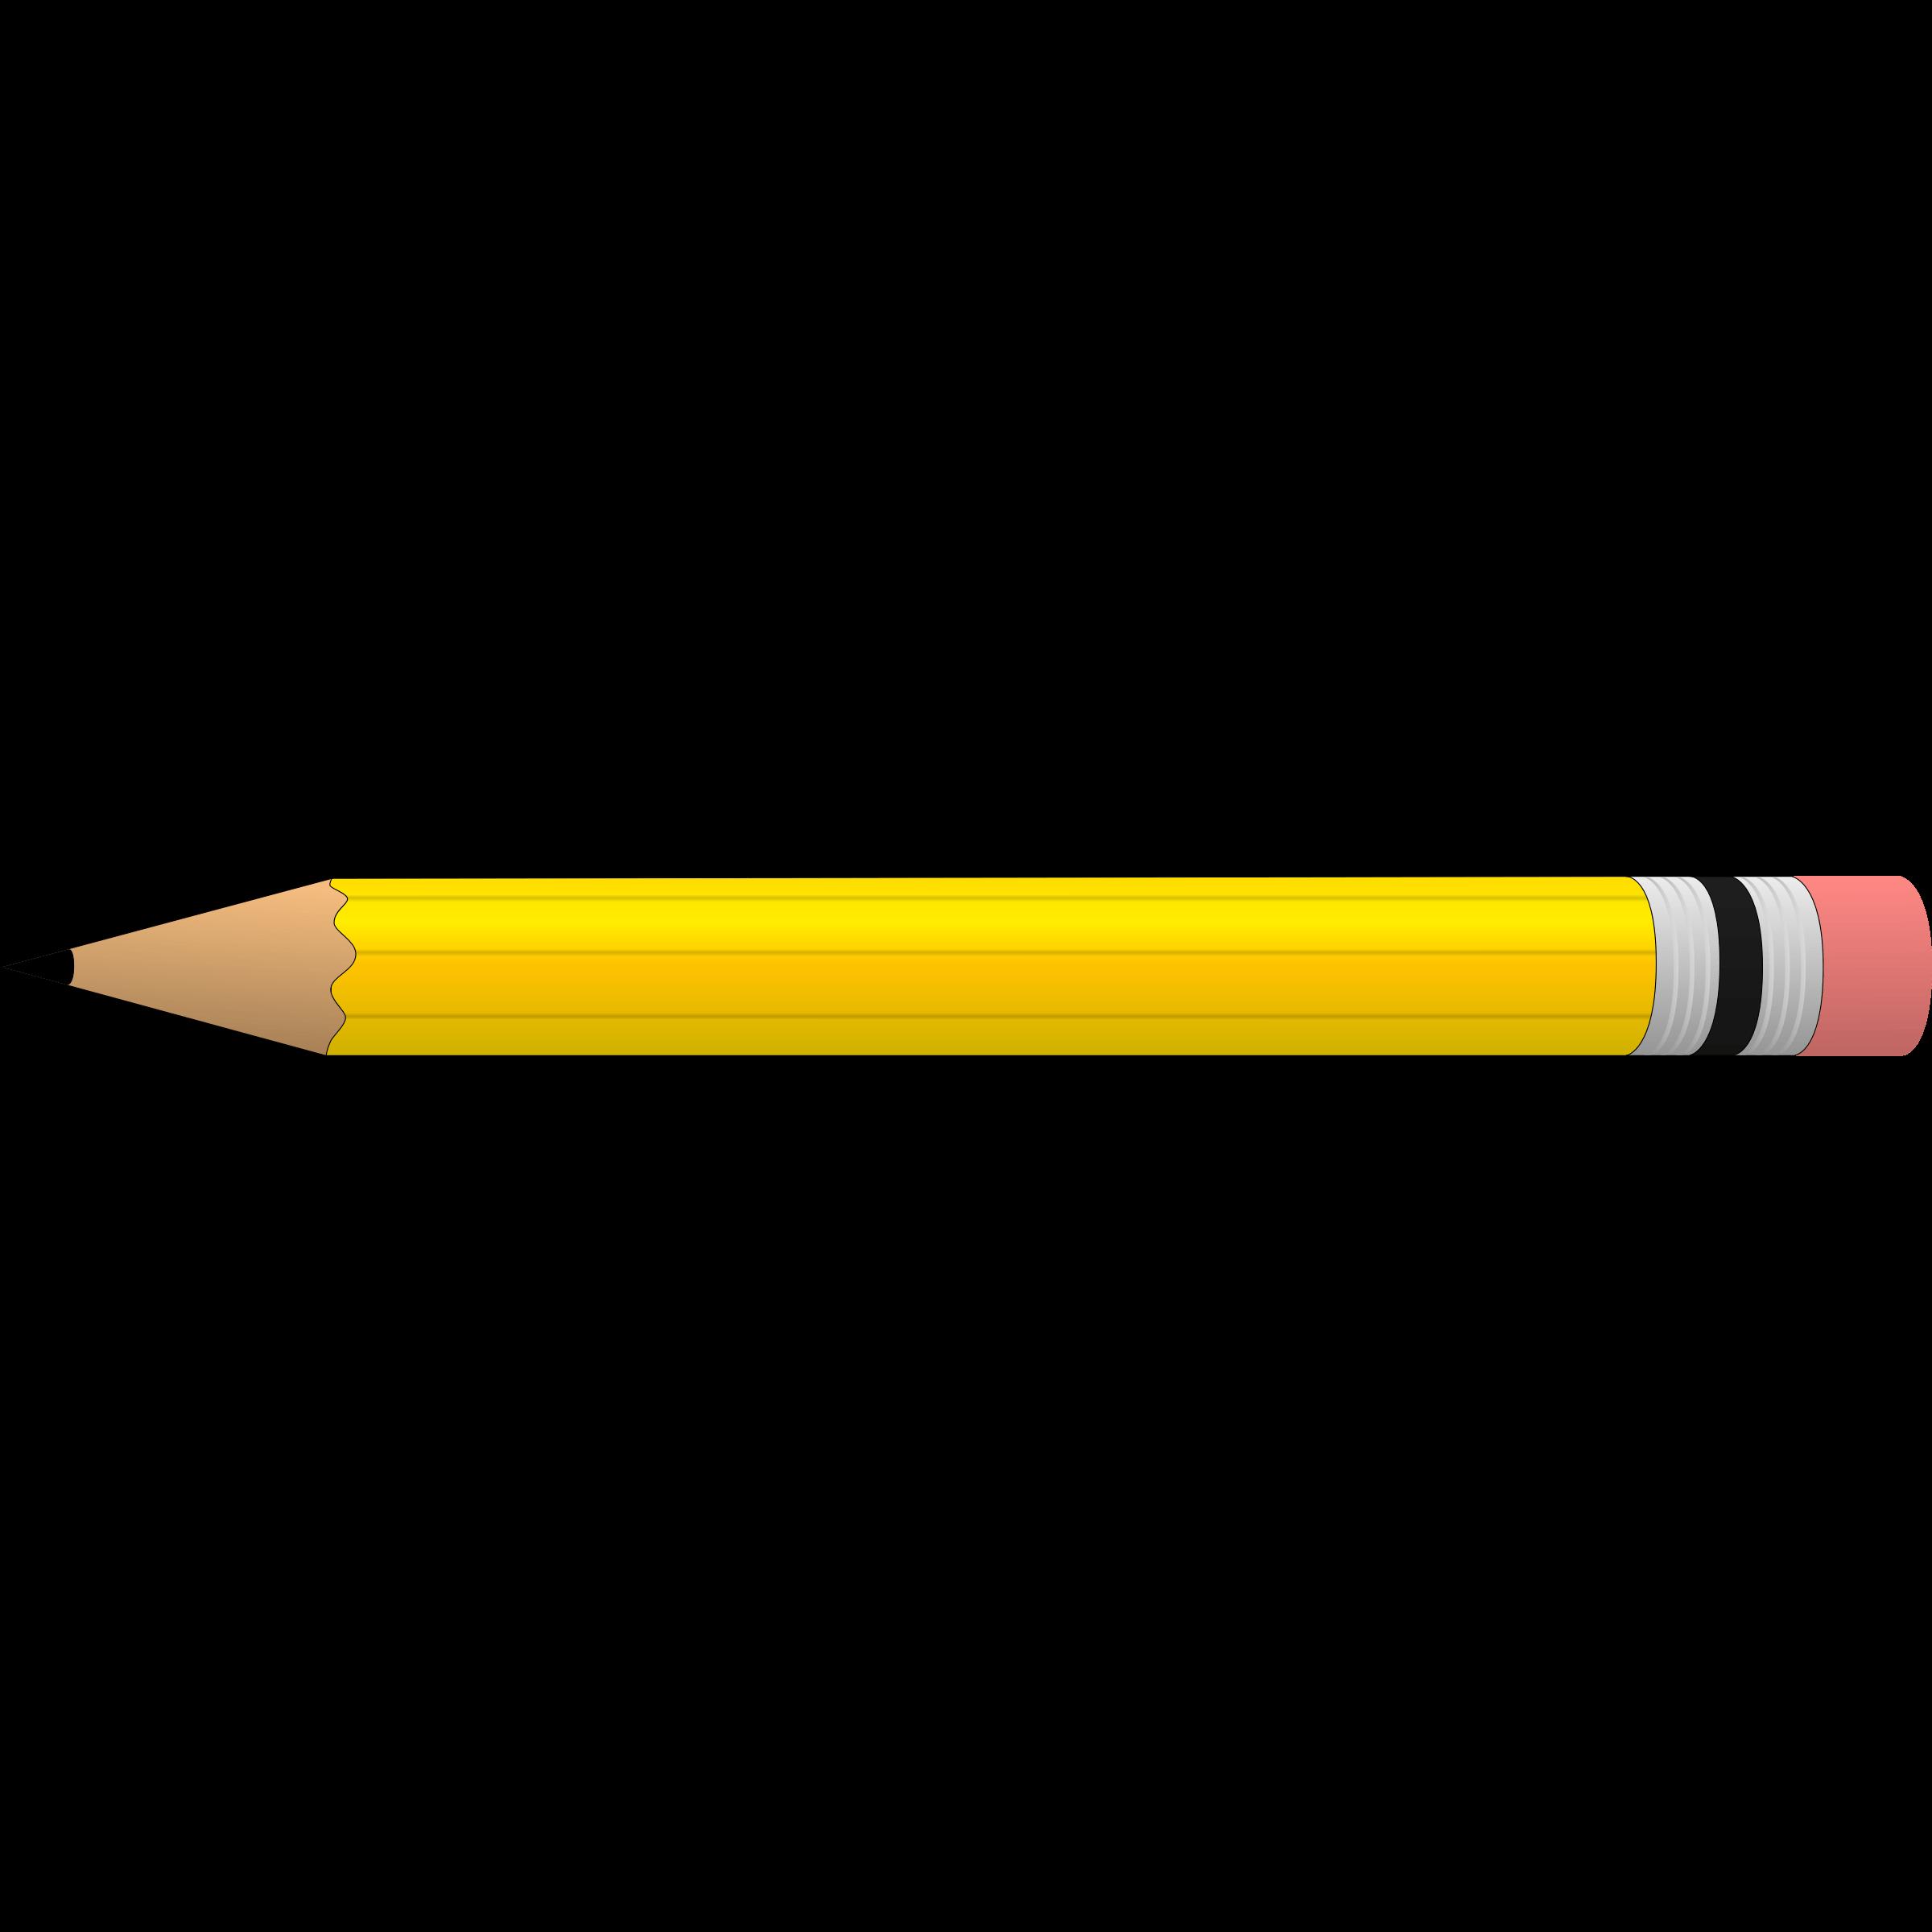 Clipart pencil transparent background. Free mechanical cliparts download